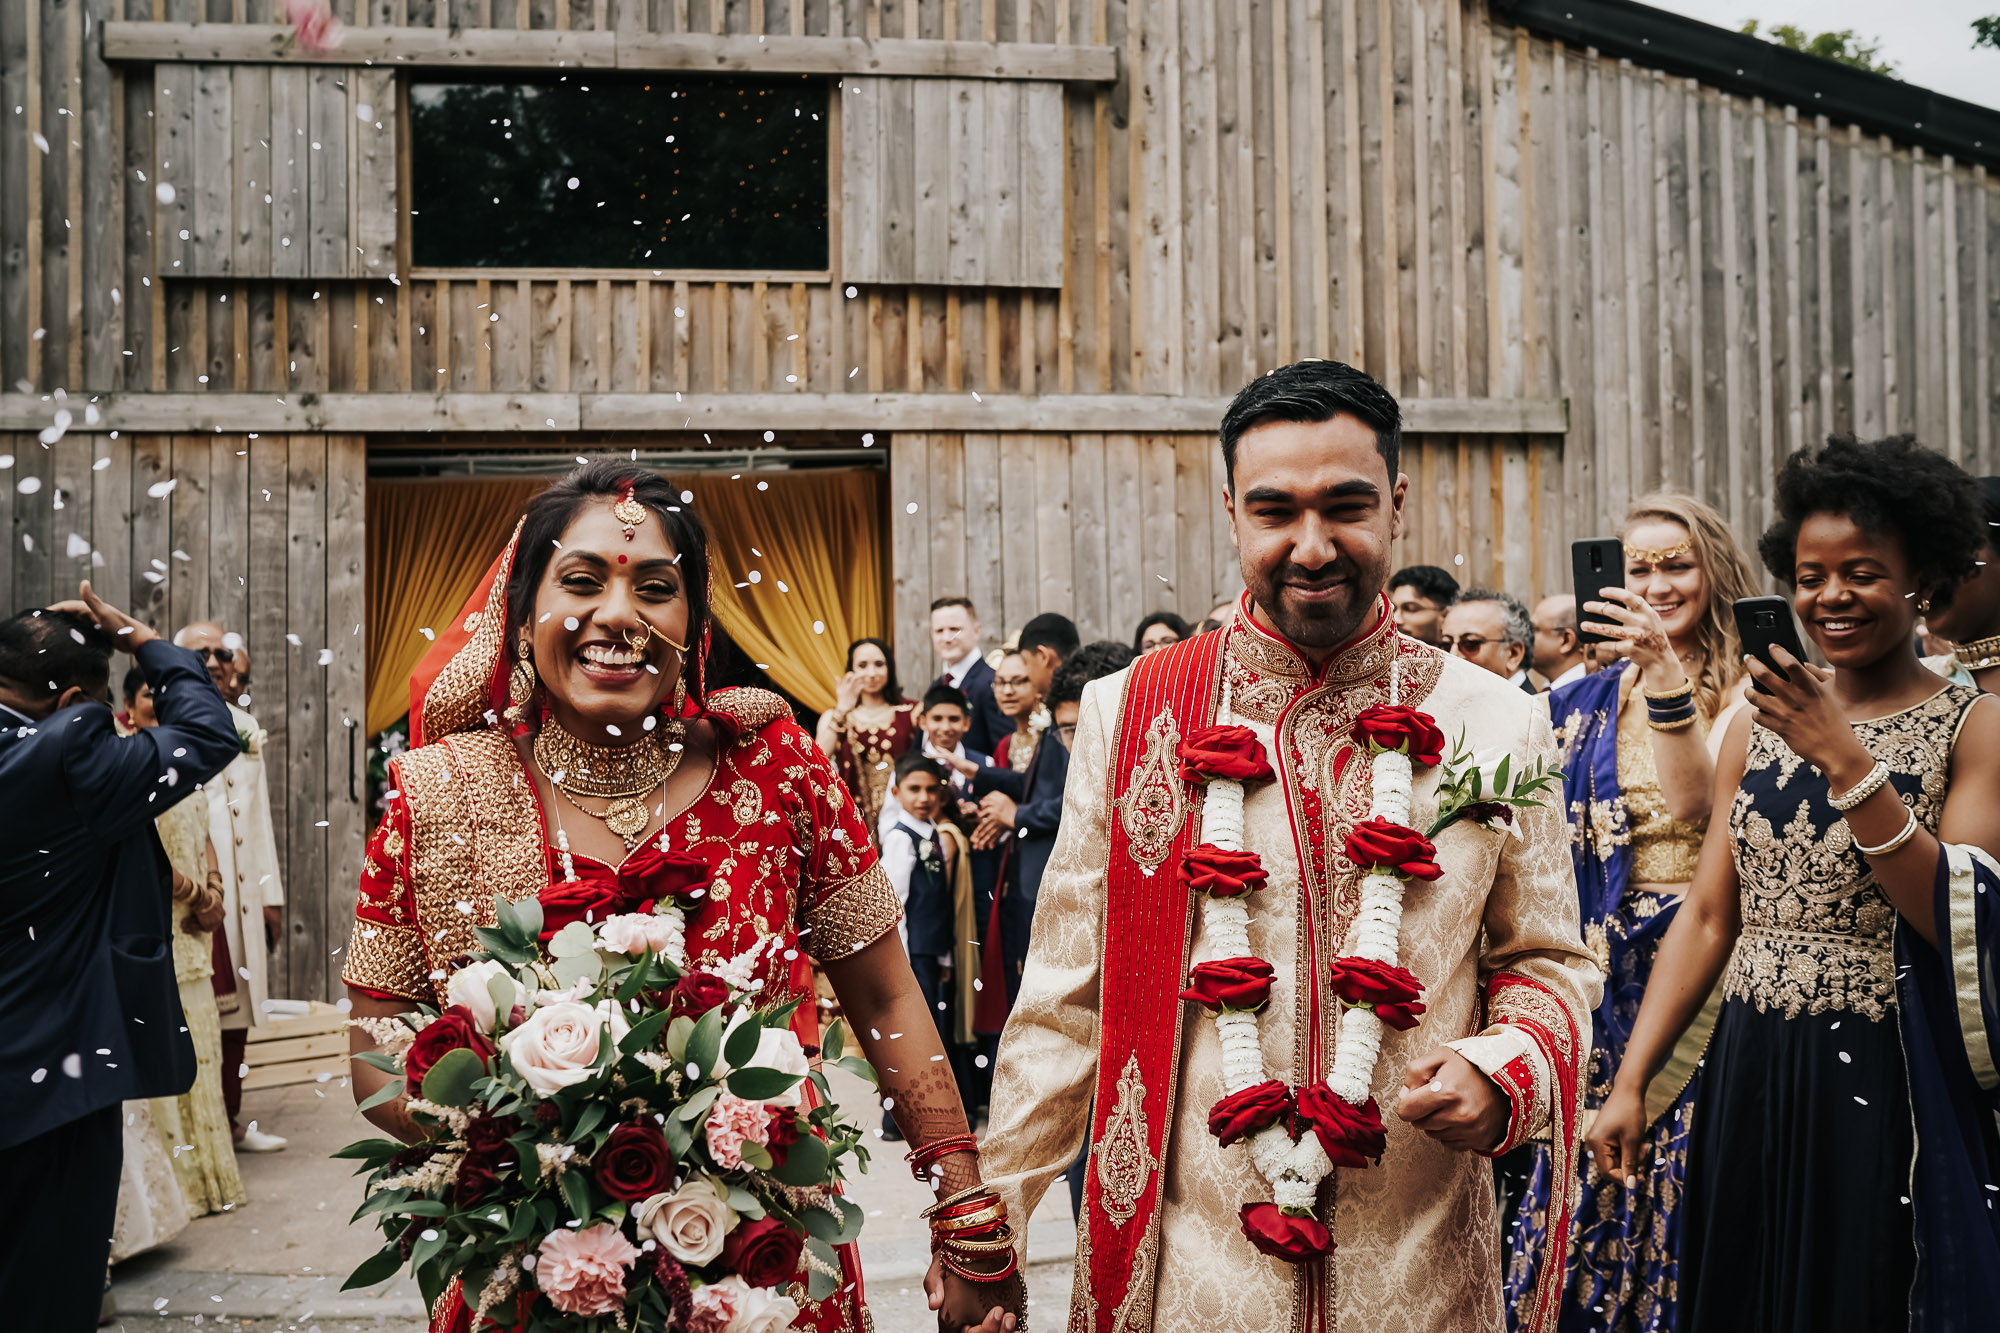 Alcumlow Hall Farm Indian Wedding Photographer (20 of 44).jpg